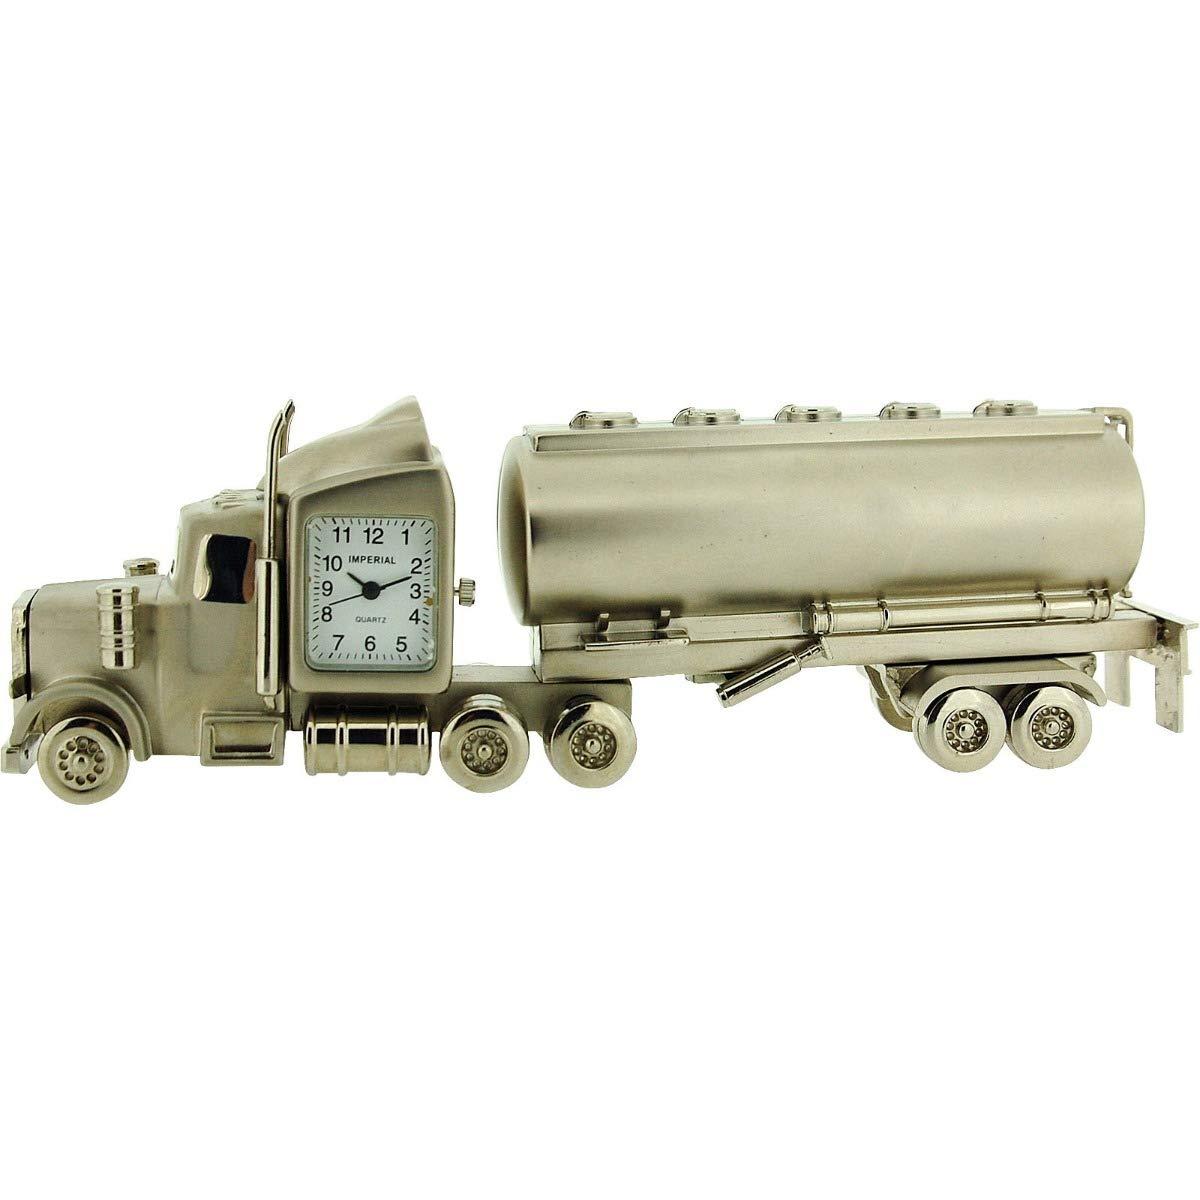 GTP Miniature Oil Tanker Silver Tone Novelty Desktop Collectors Clock IMP1072T